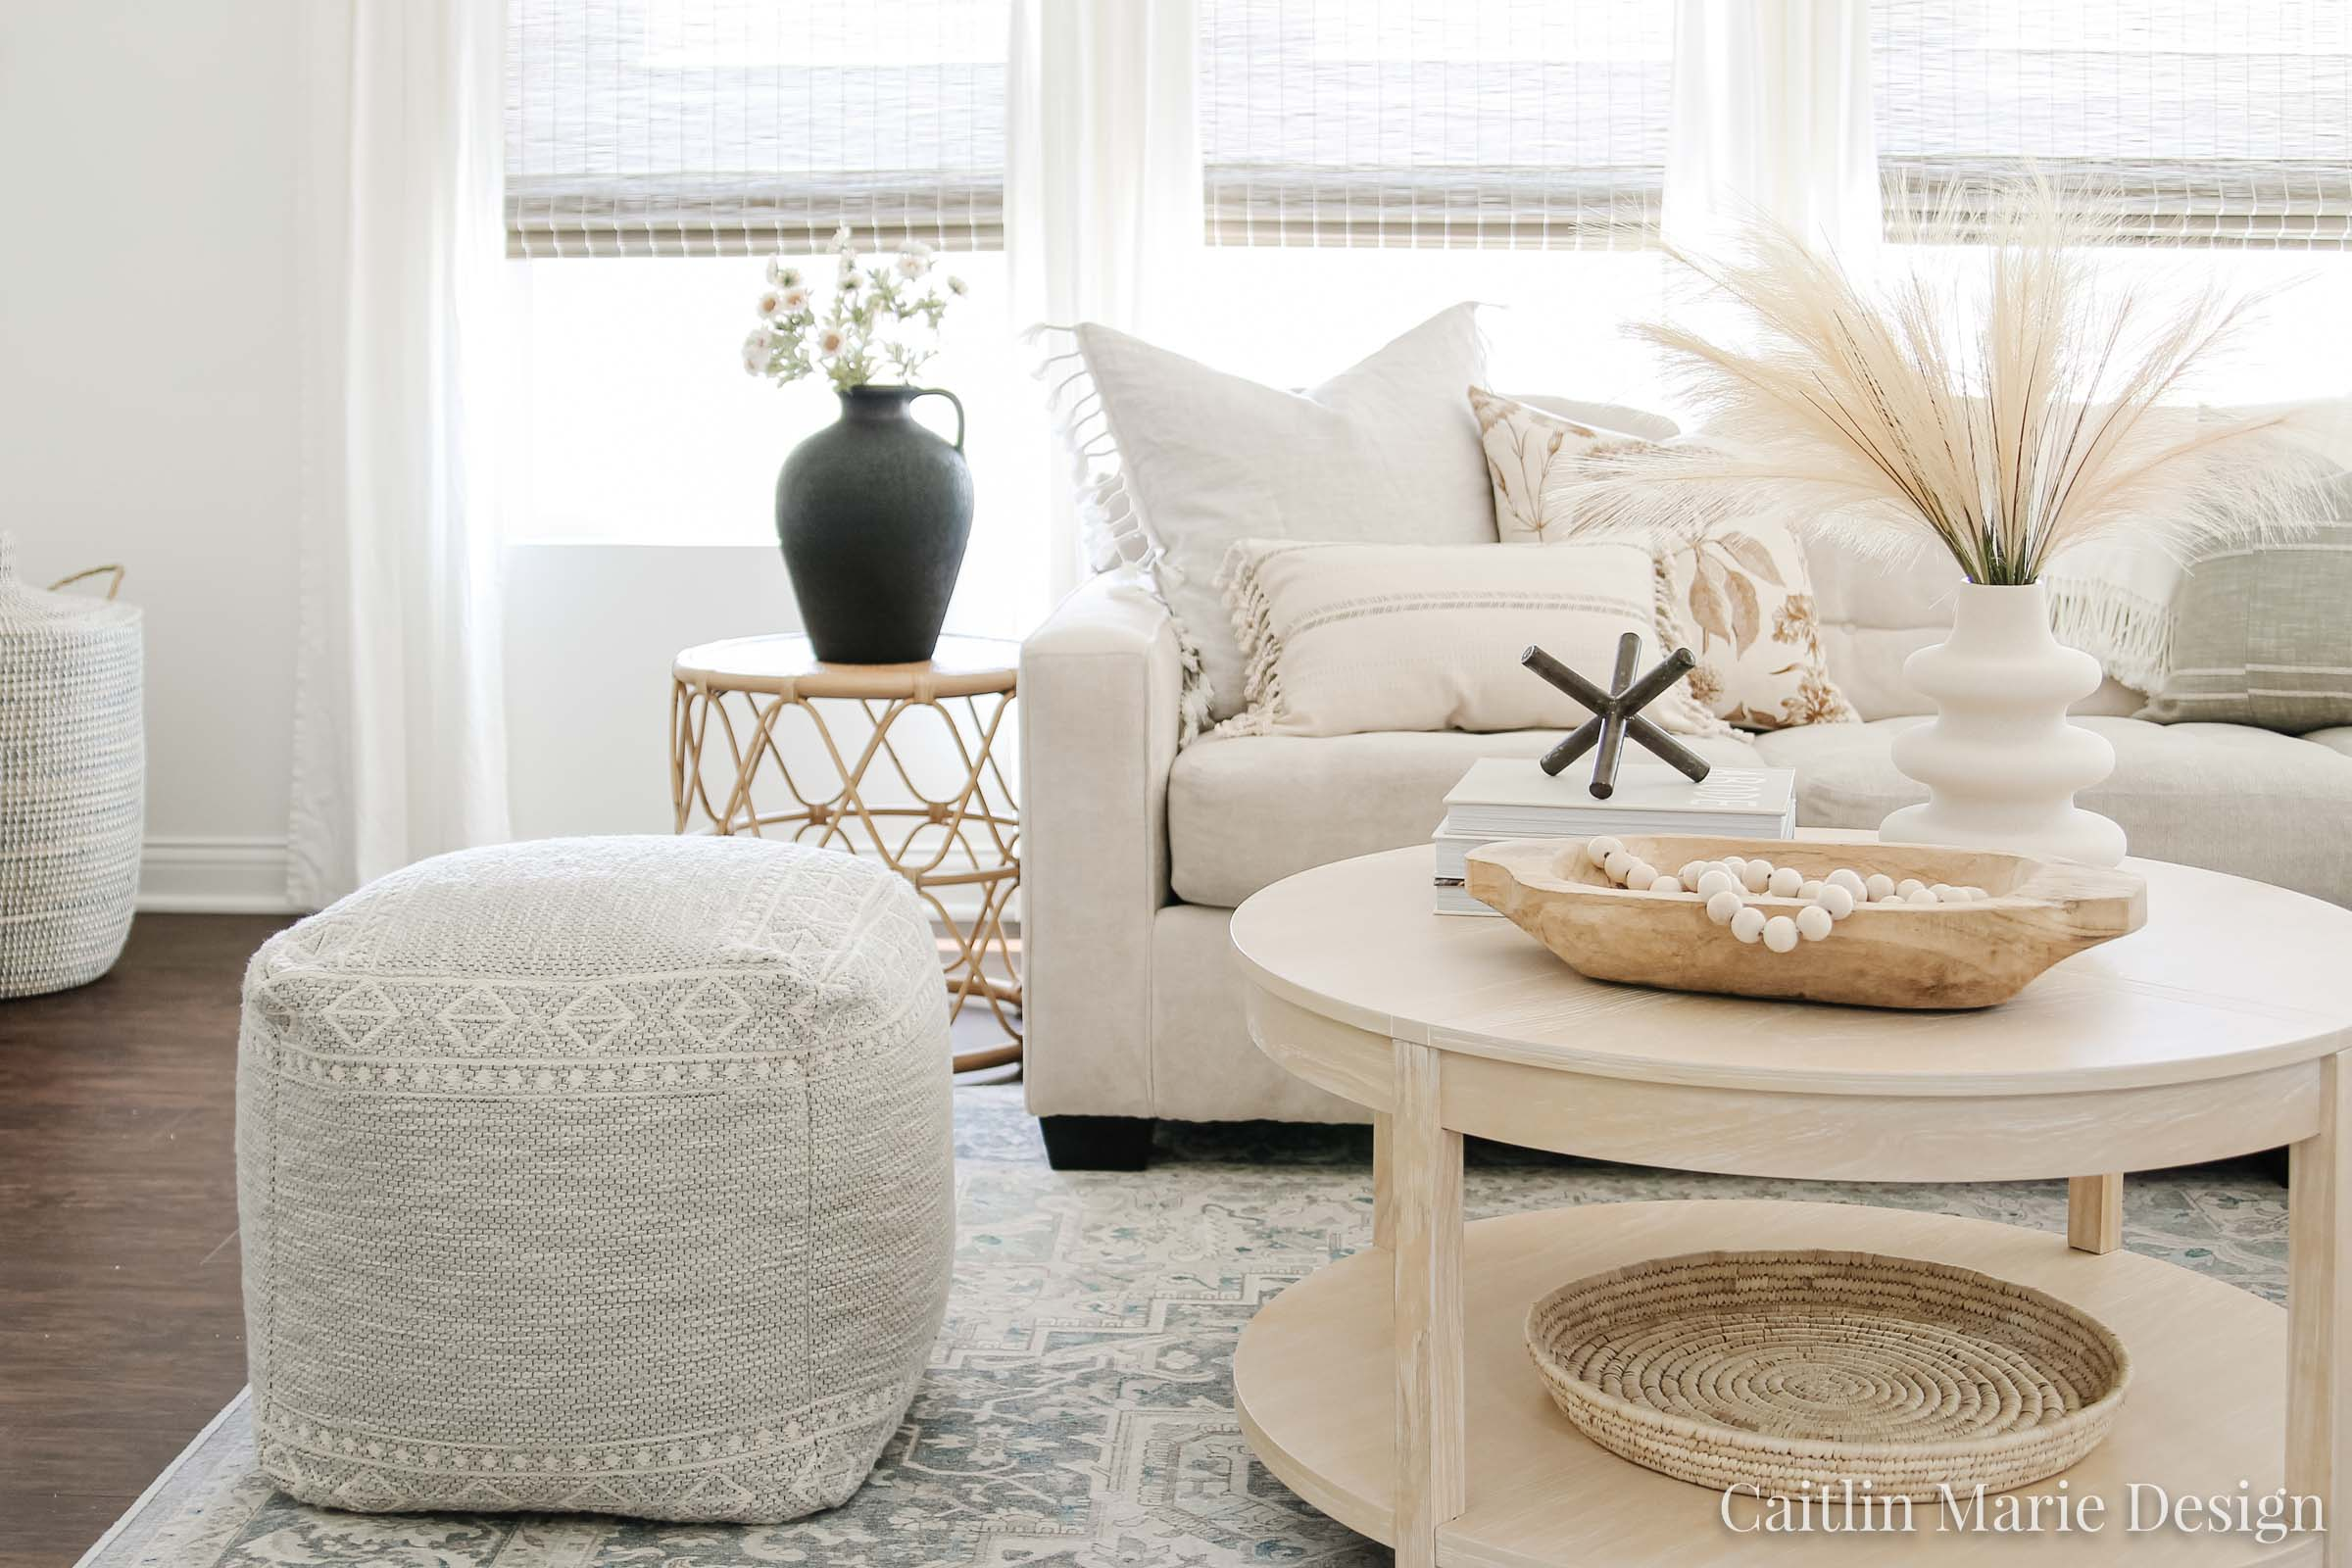 Minimalist Fall Decor | Fall Home Tour 2020 | modern traditional living room, cozy living room, aesthetic decor, modern coastal, round coffee table, black vase